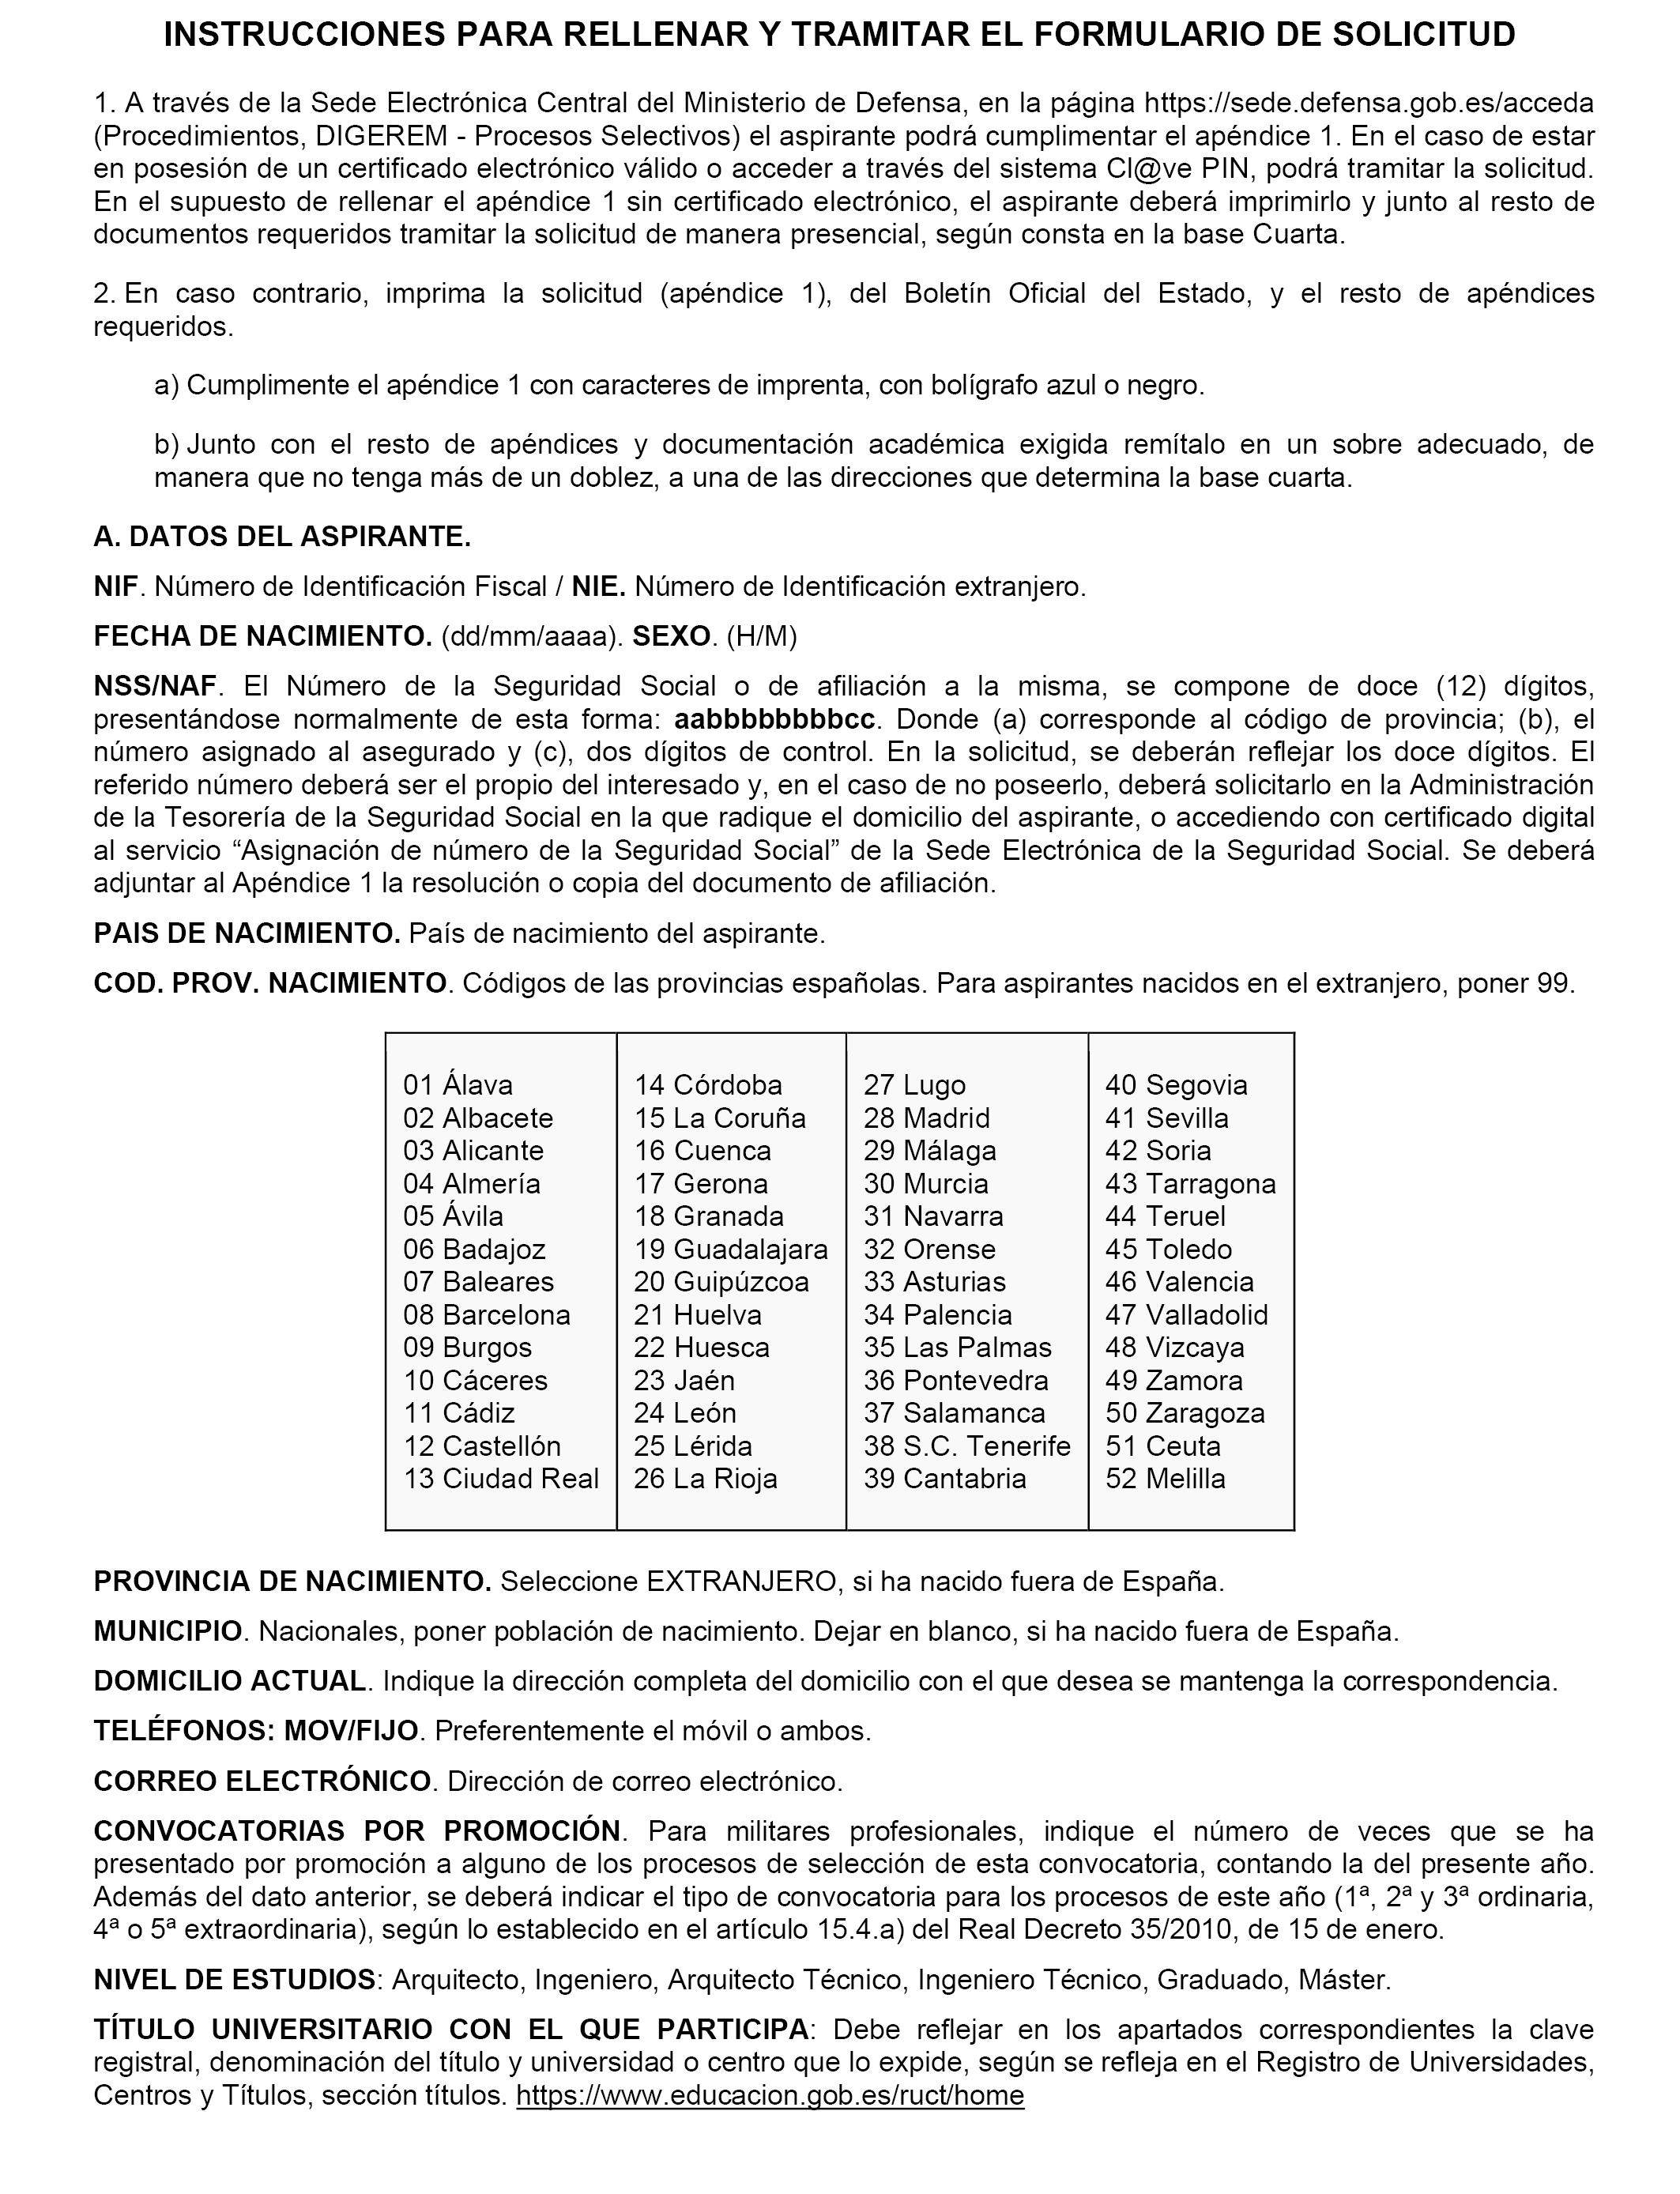 BOE.es - Documento BOE-A-2016-4871